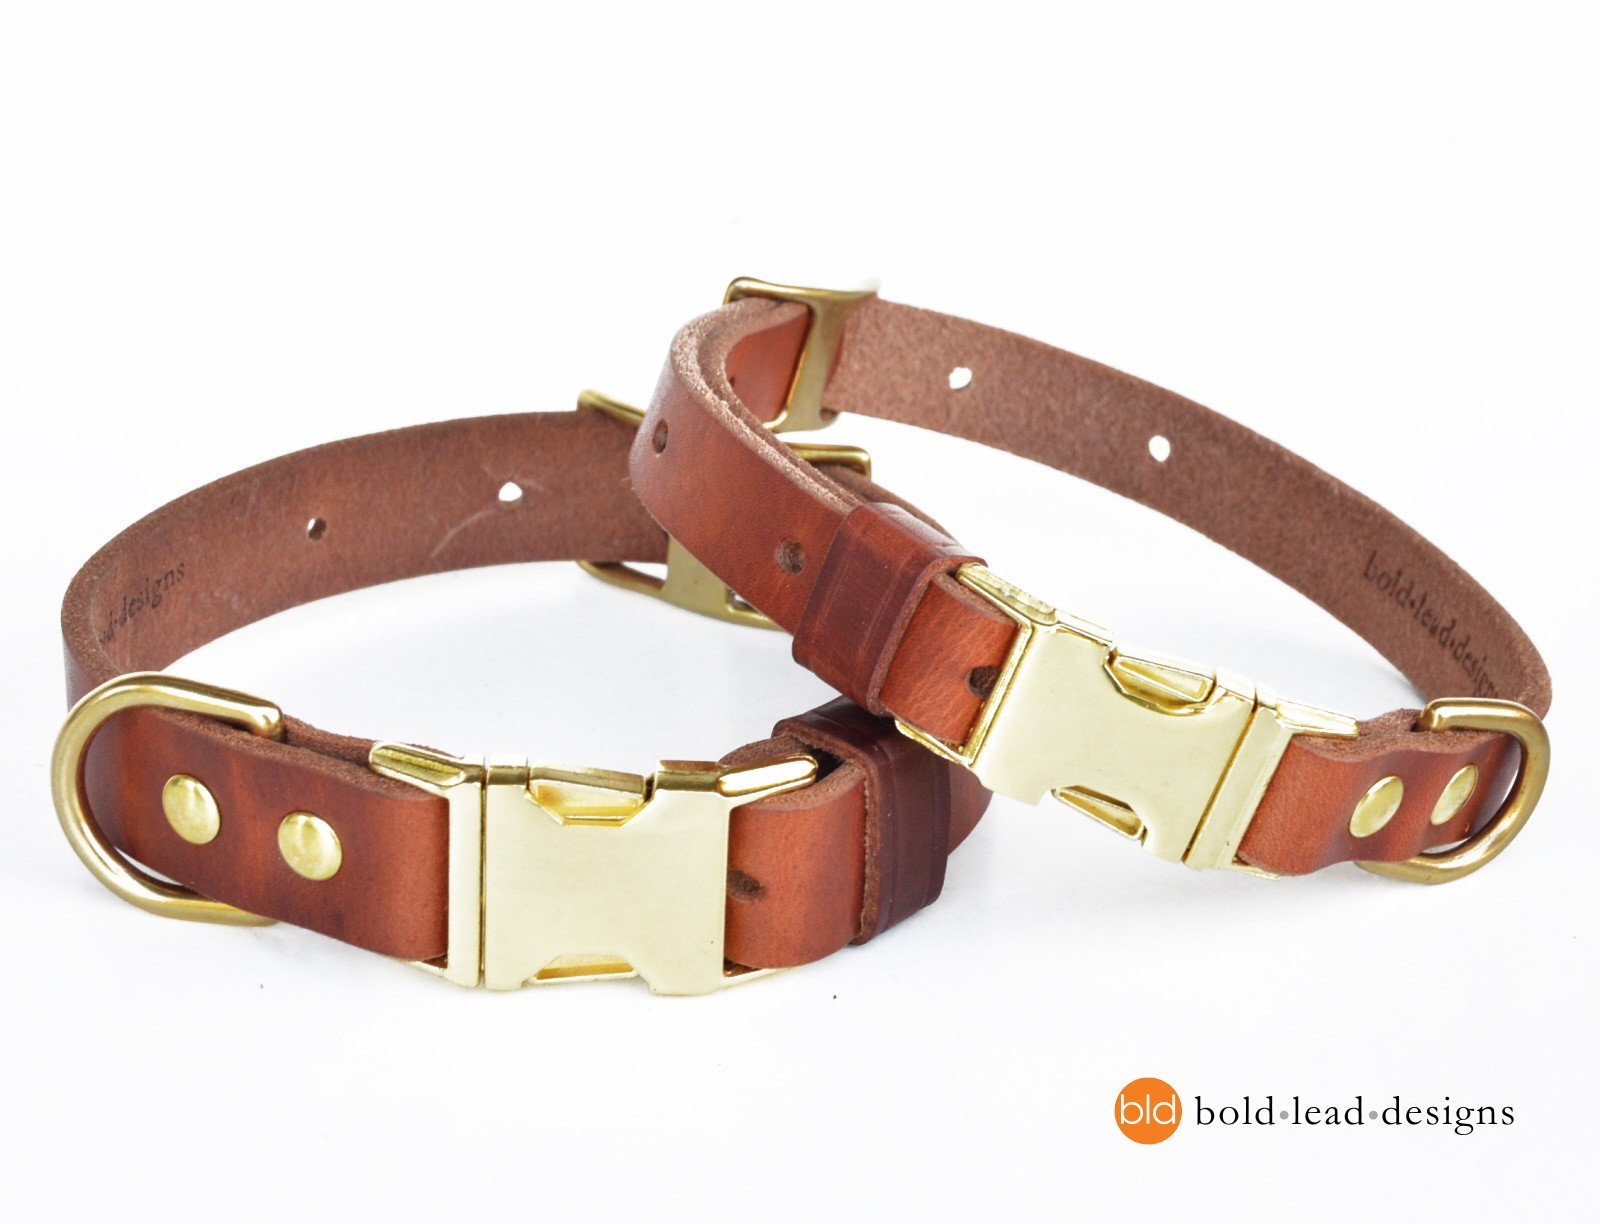 Metal Side Release Buckle Dog Collars